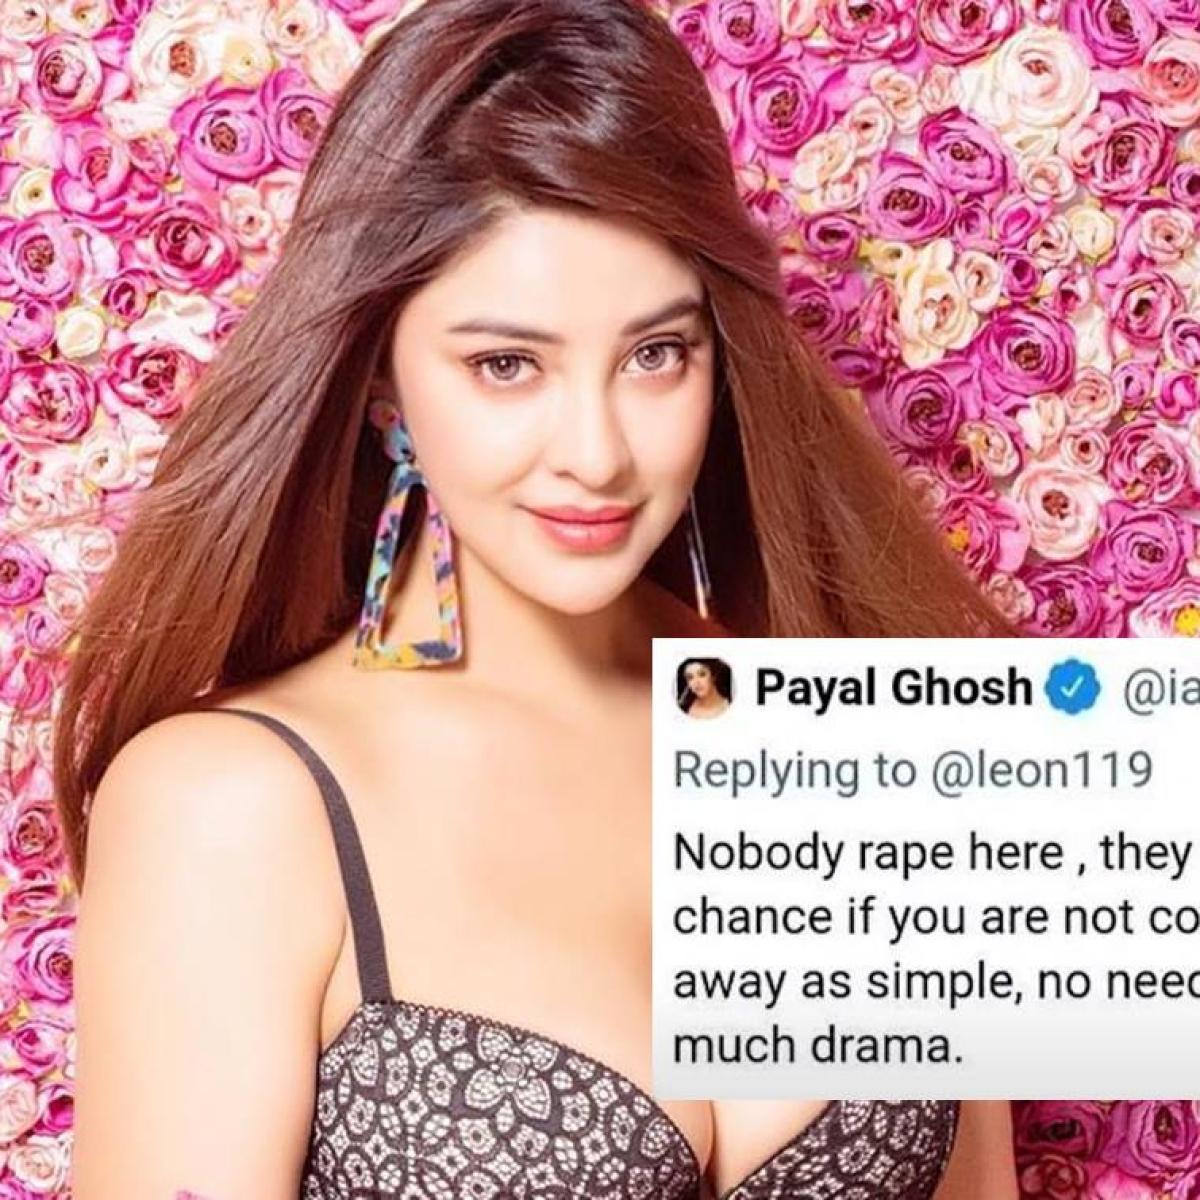 Payal Ghosh's 2018 tweet on 'rape' goes viral amid MeToo allegations against Anurag Kashyap